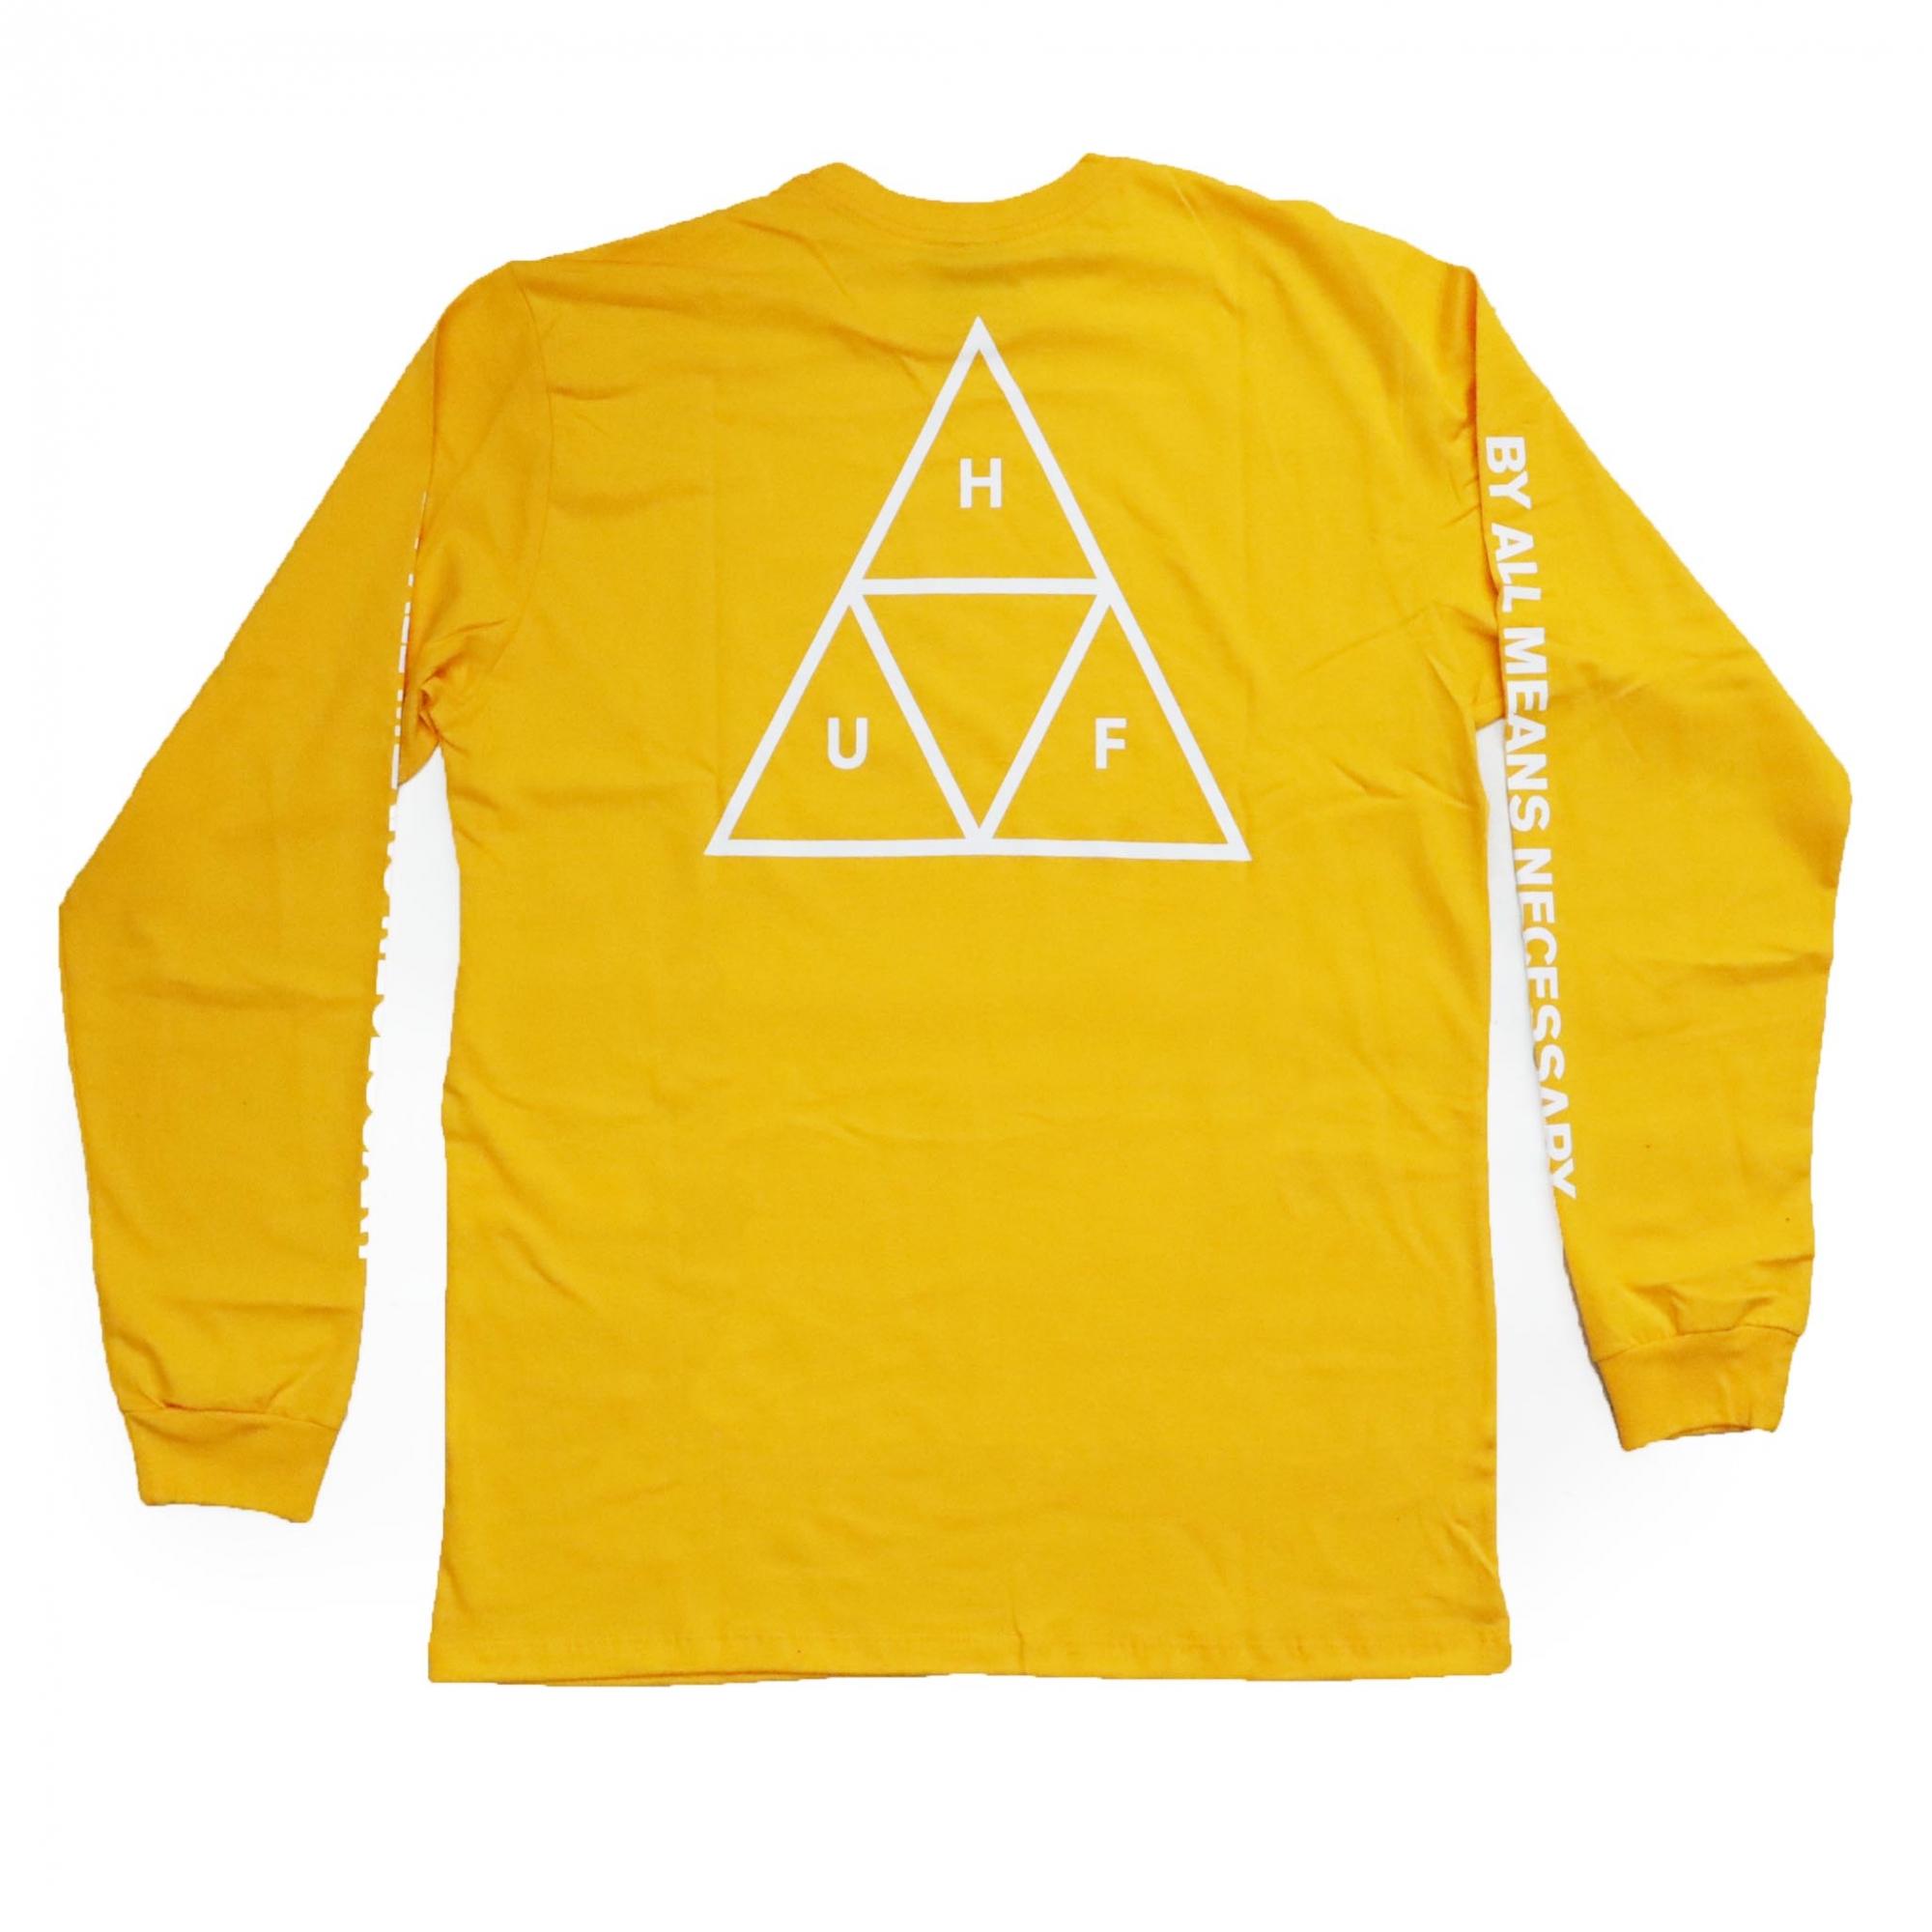 Camiseta Manga Longa HUF Essentials TT - Amarelo